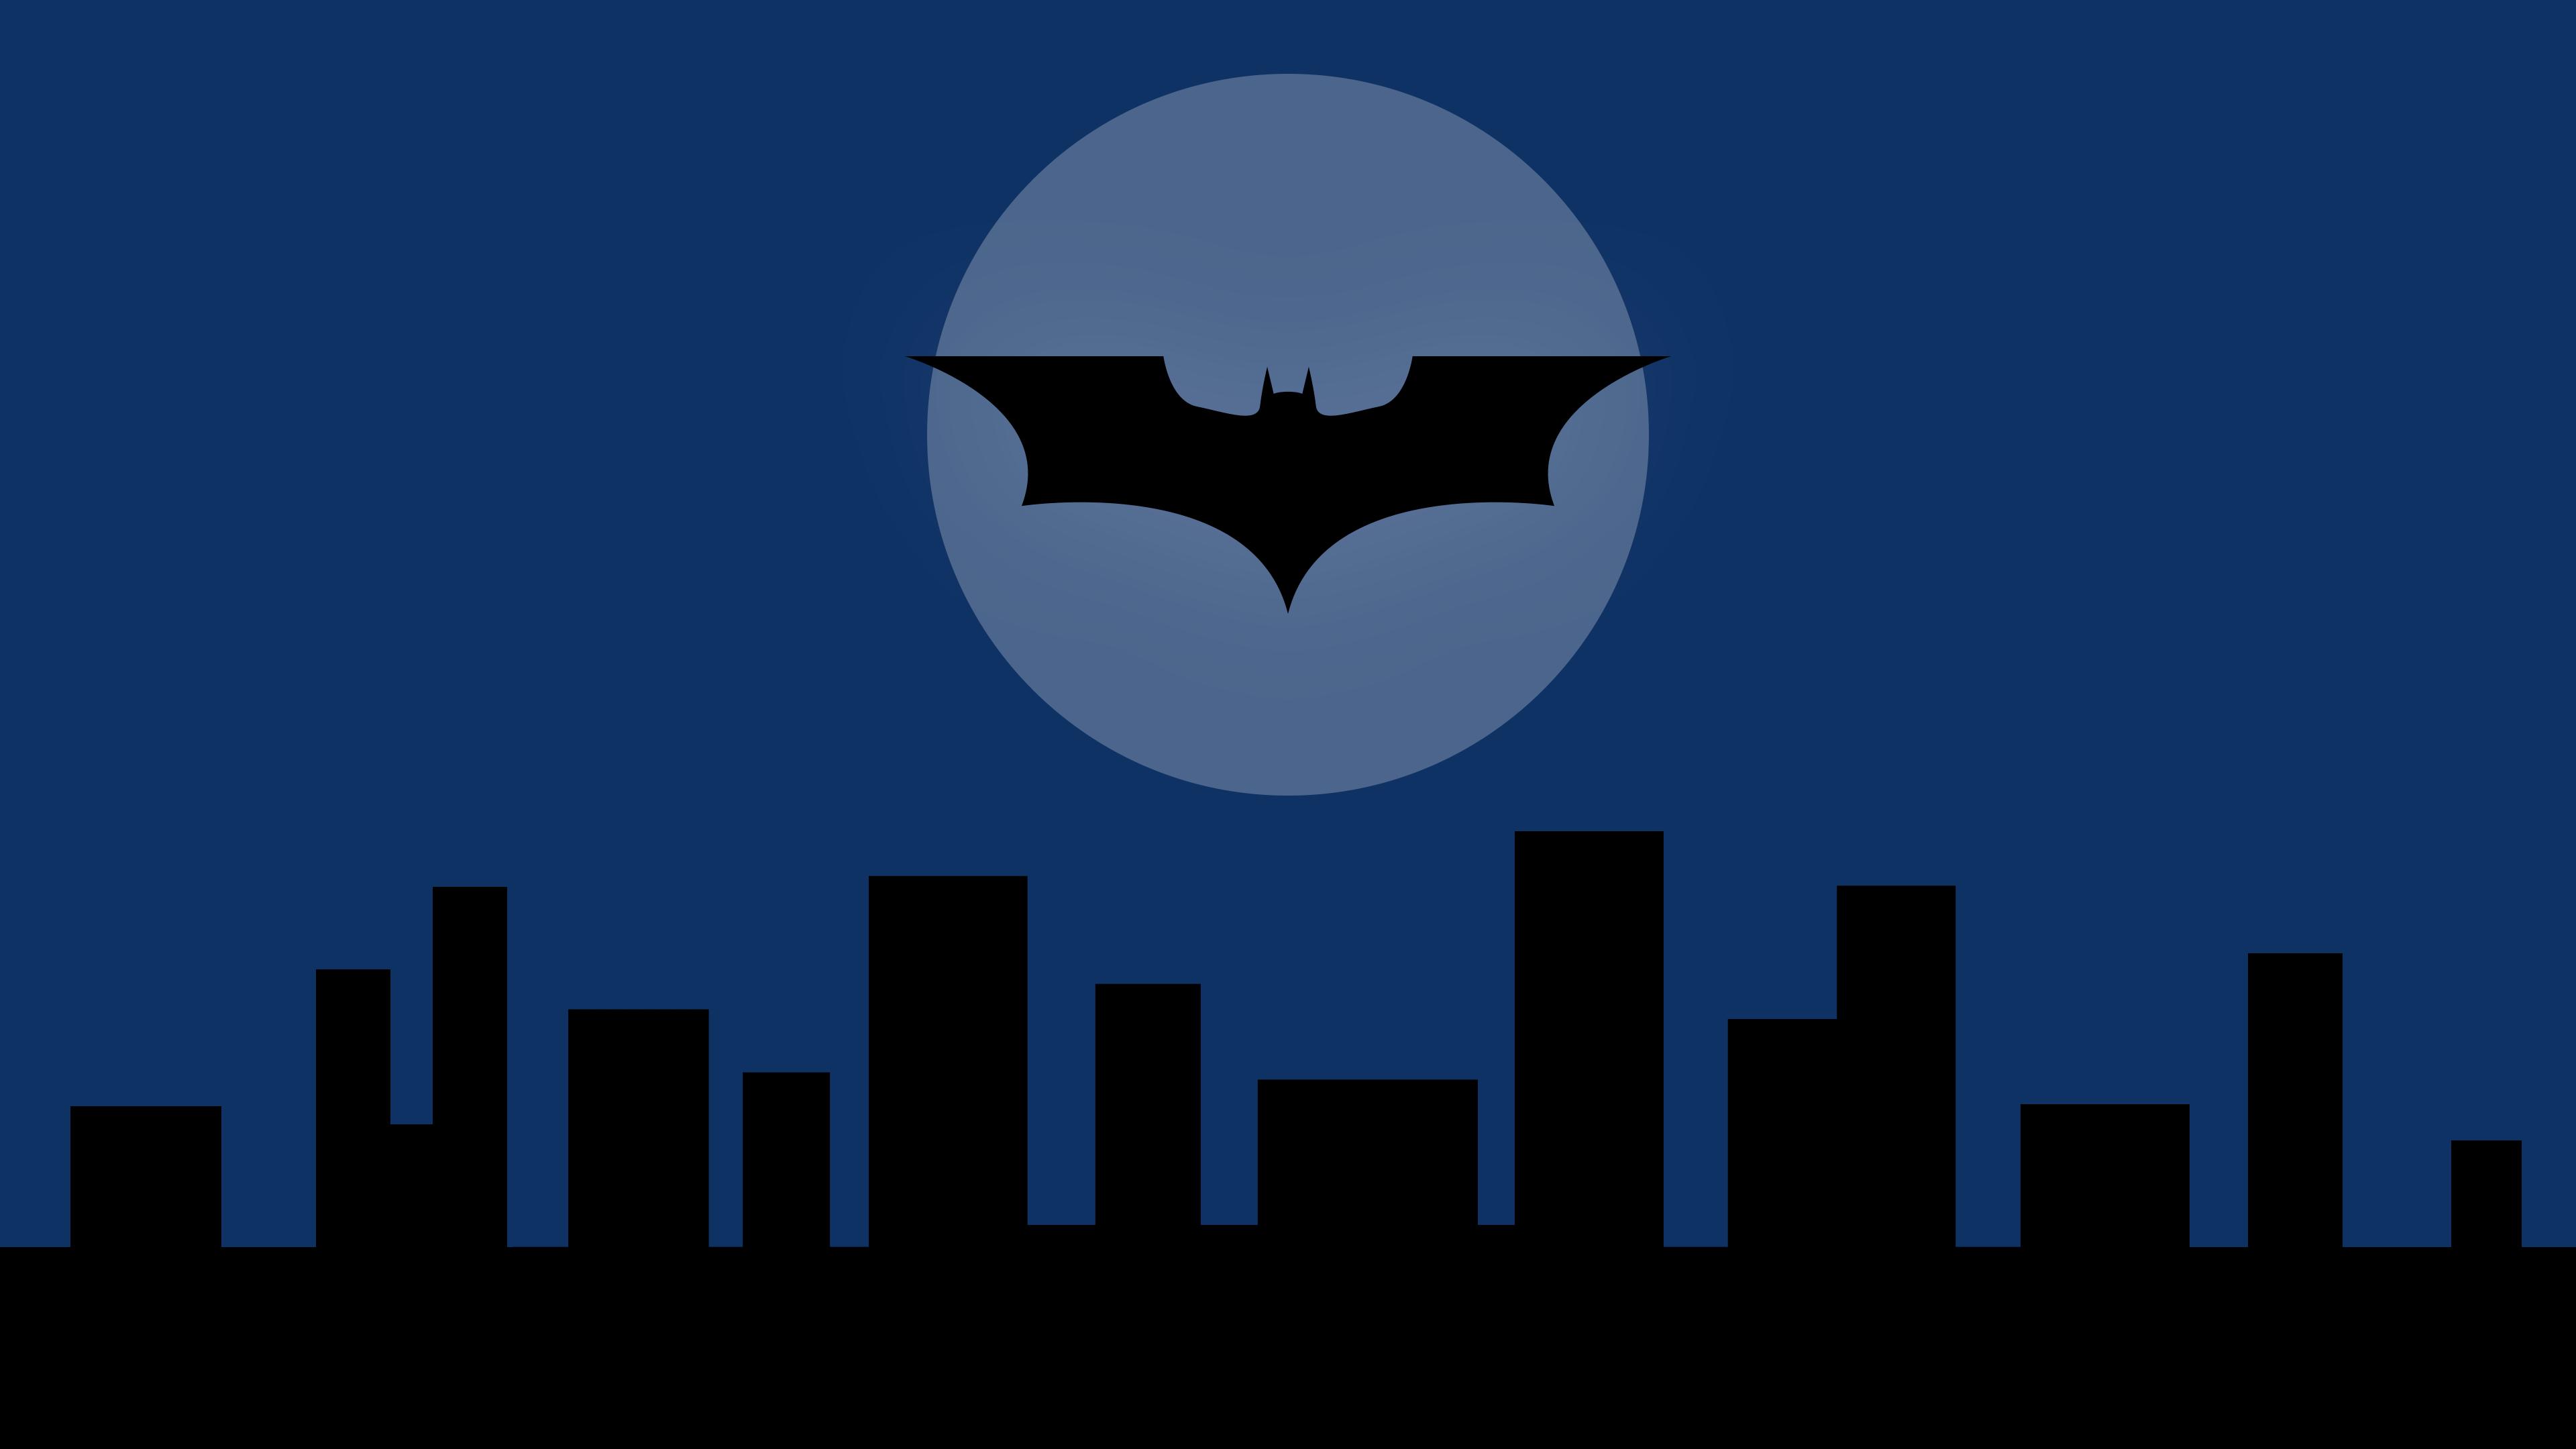 Nike Wallpaper Hd Batman Gotham City Wallpaper